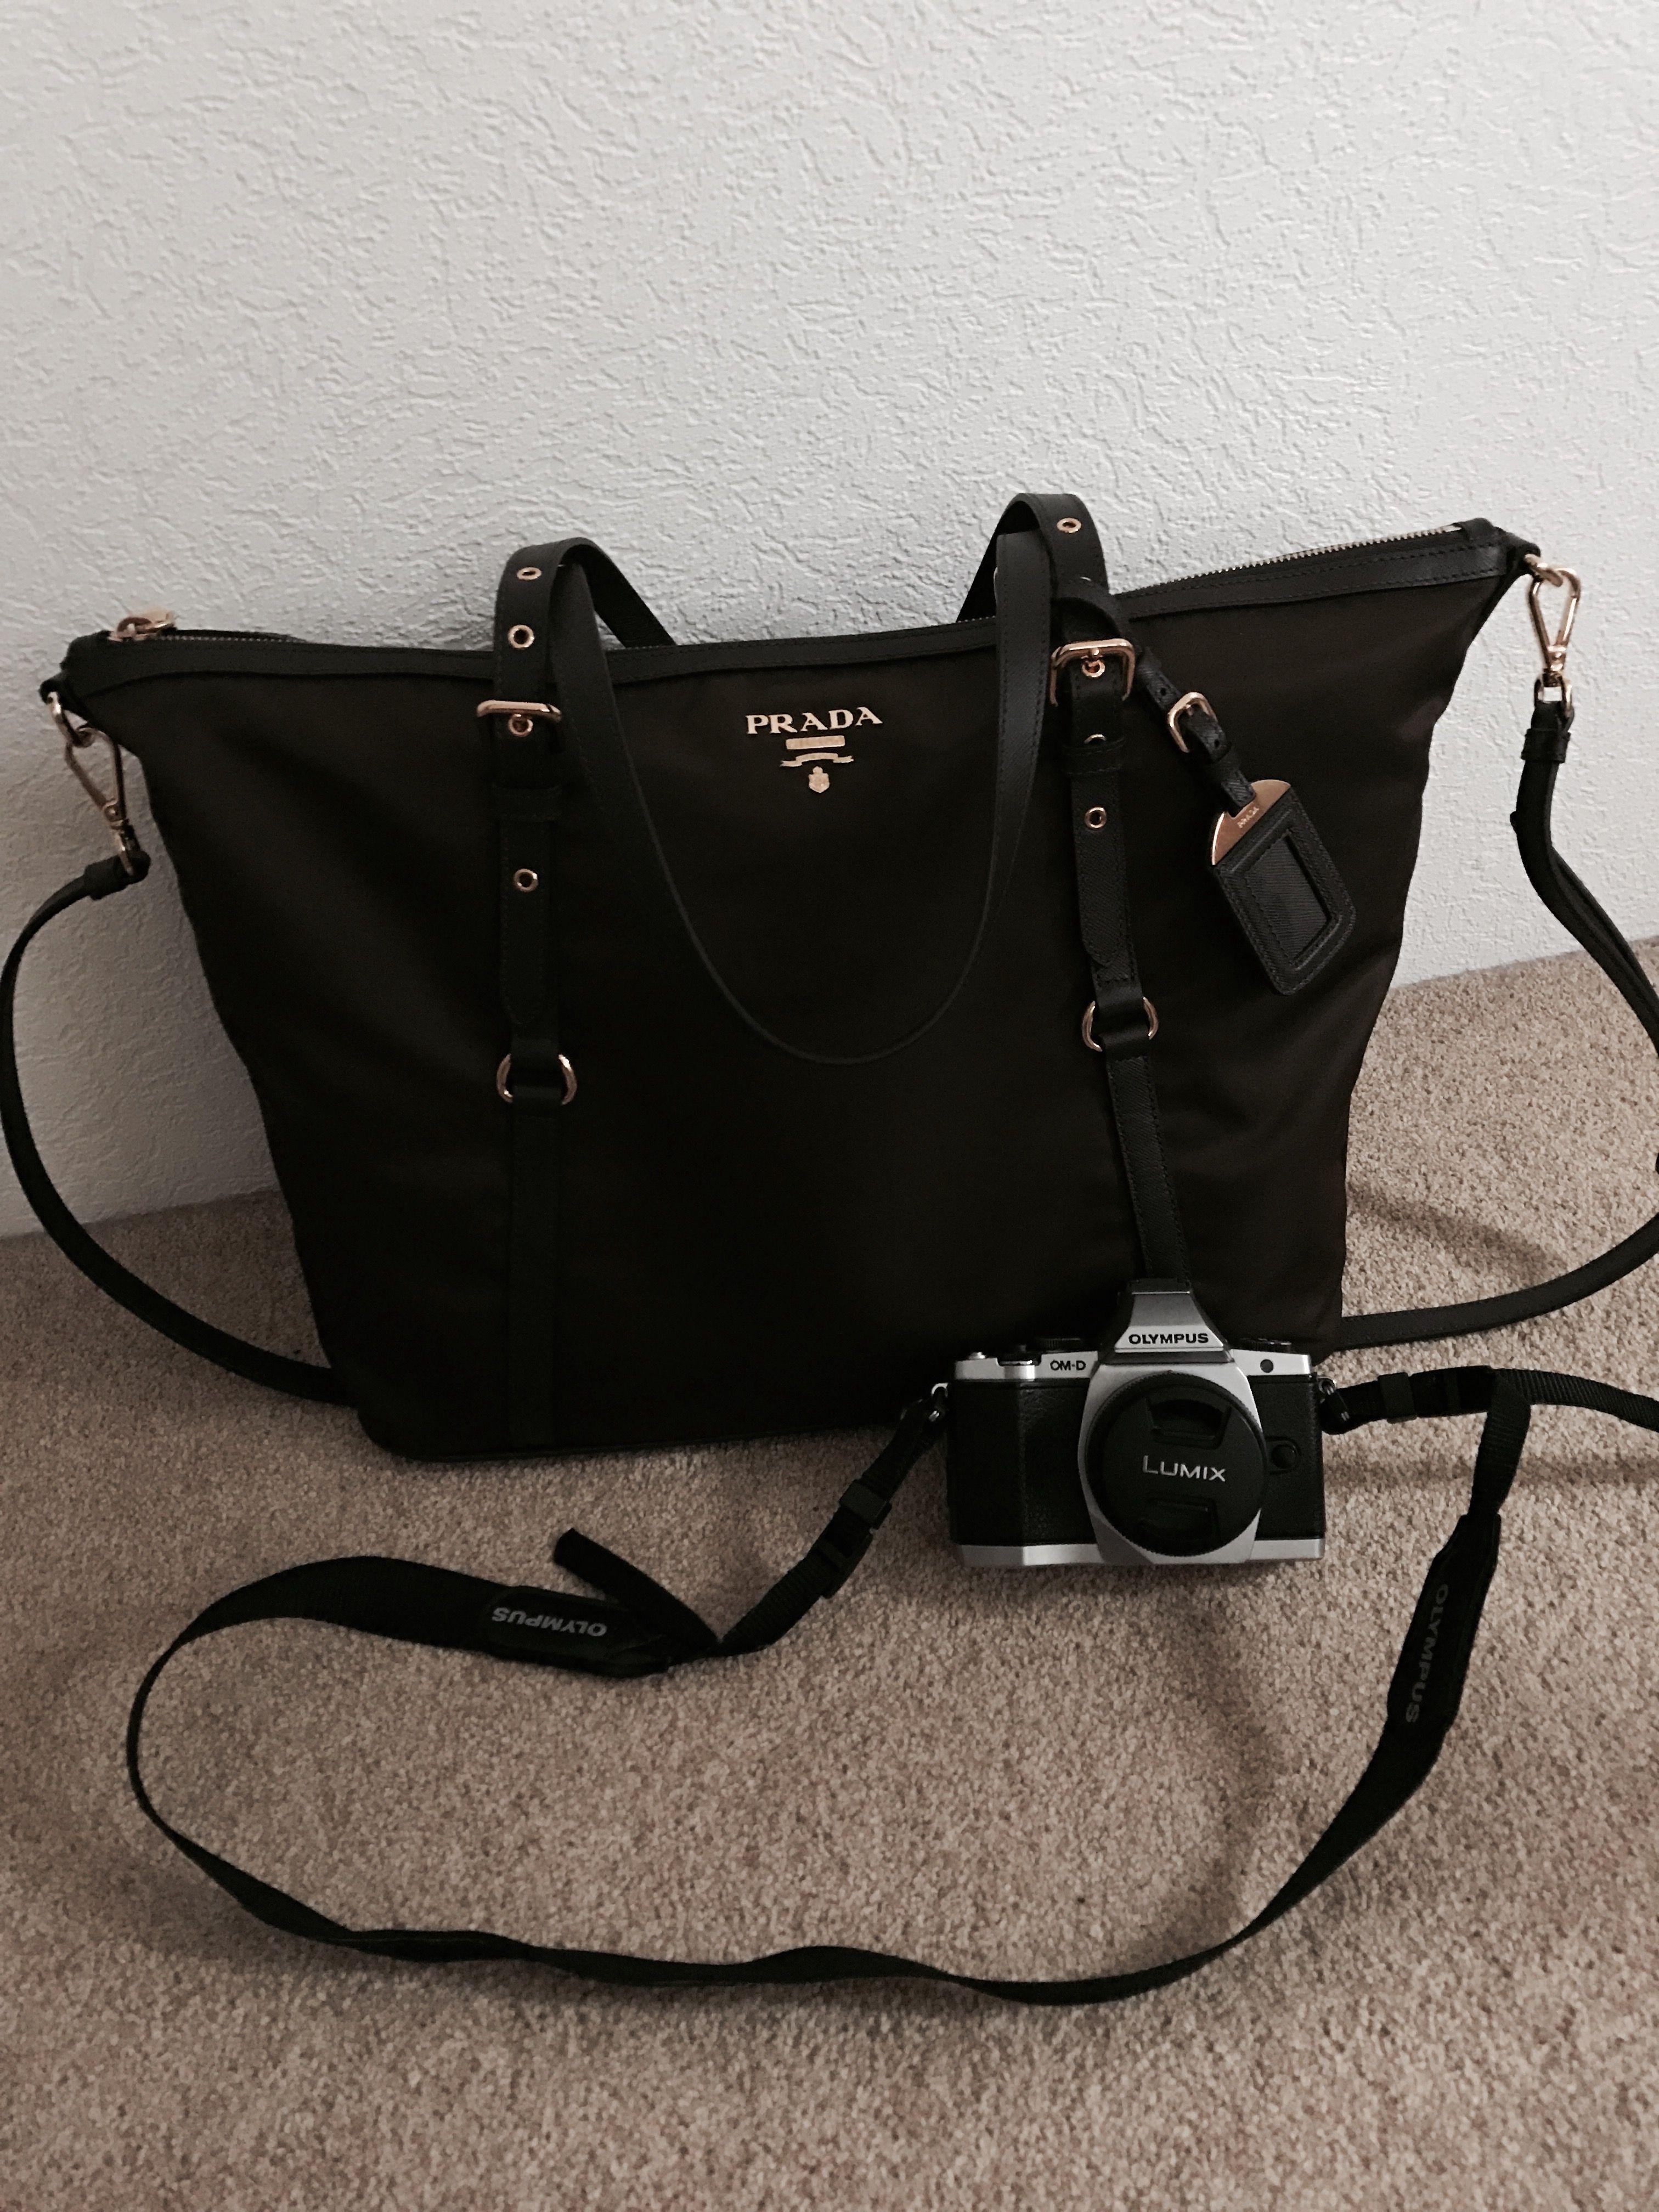 0ccc1092c5 ... low price prada tessuto nylon saffiano bag my go to bag especially when  traveling.. ...